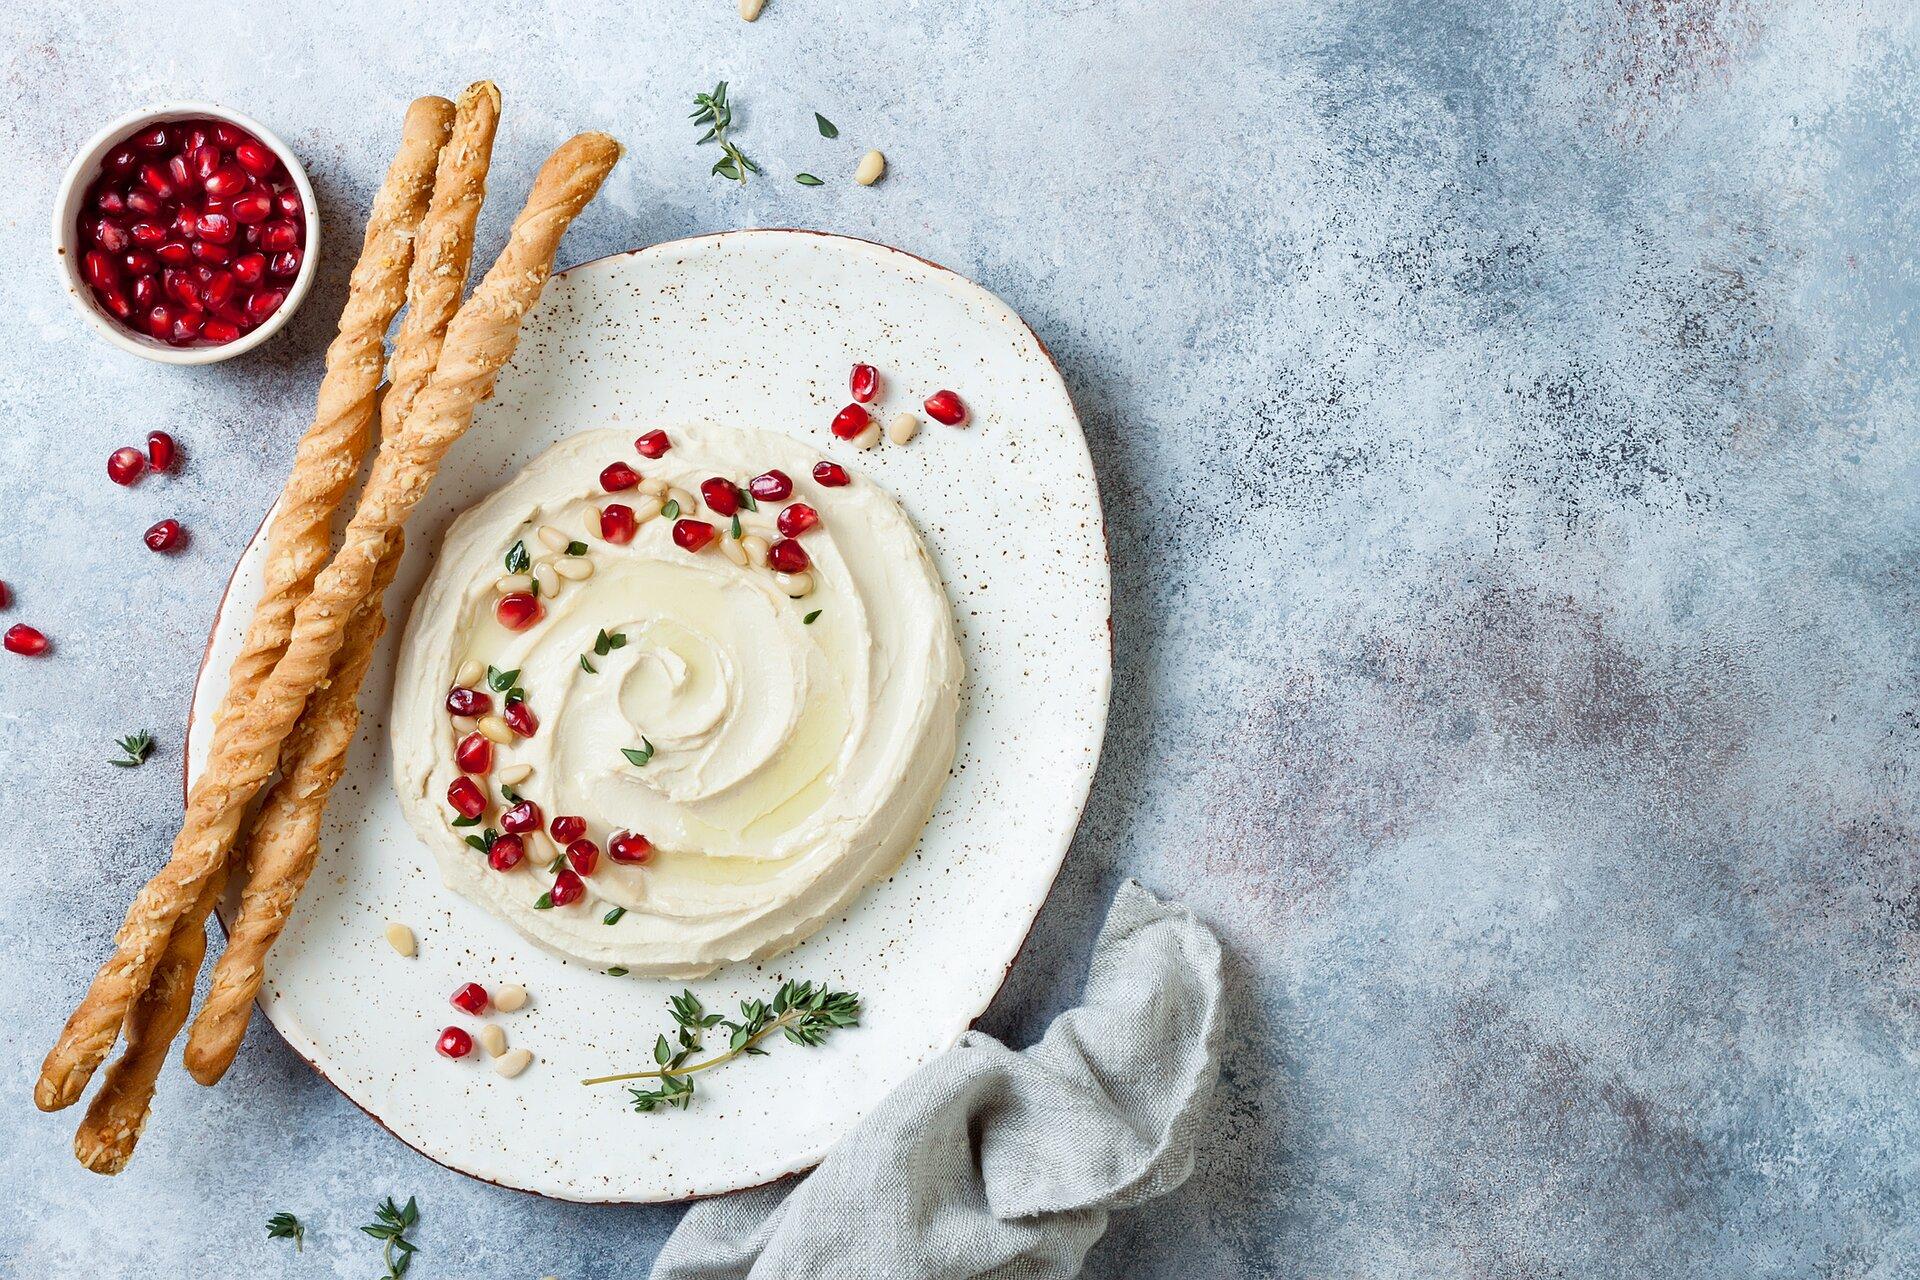 Hummus Ricetta Semplice Senza Tahina.Ricetta Hummus Senza Tahina Dal Medioriente Agrodolce